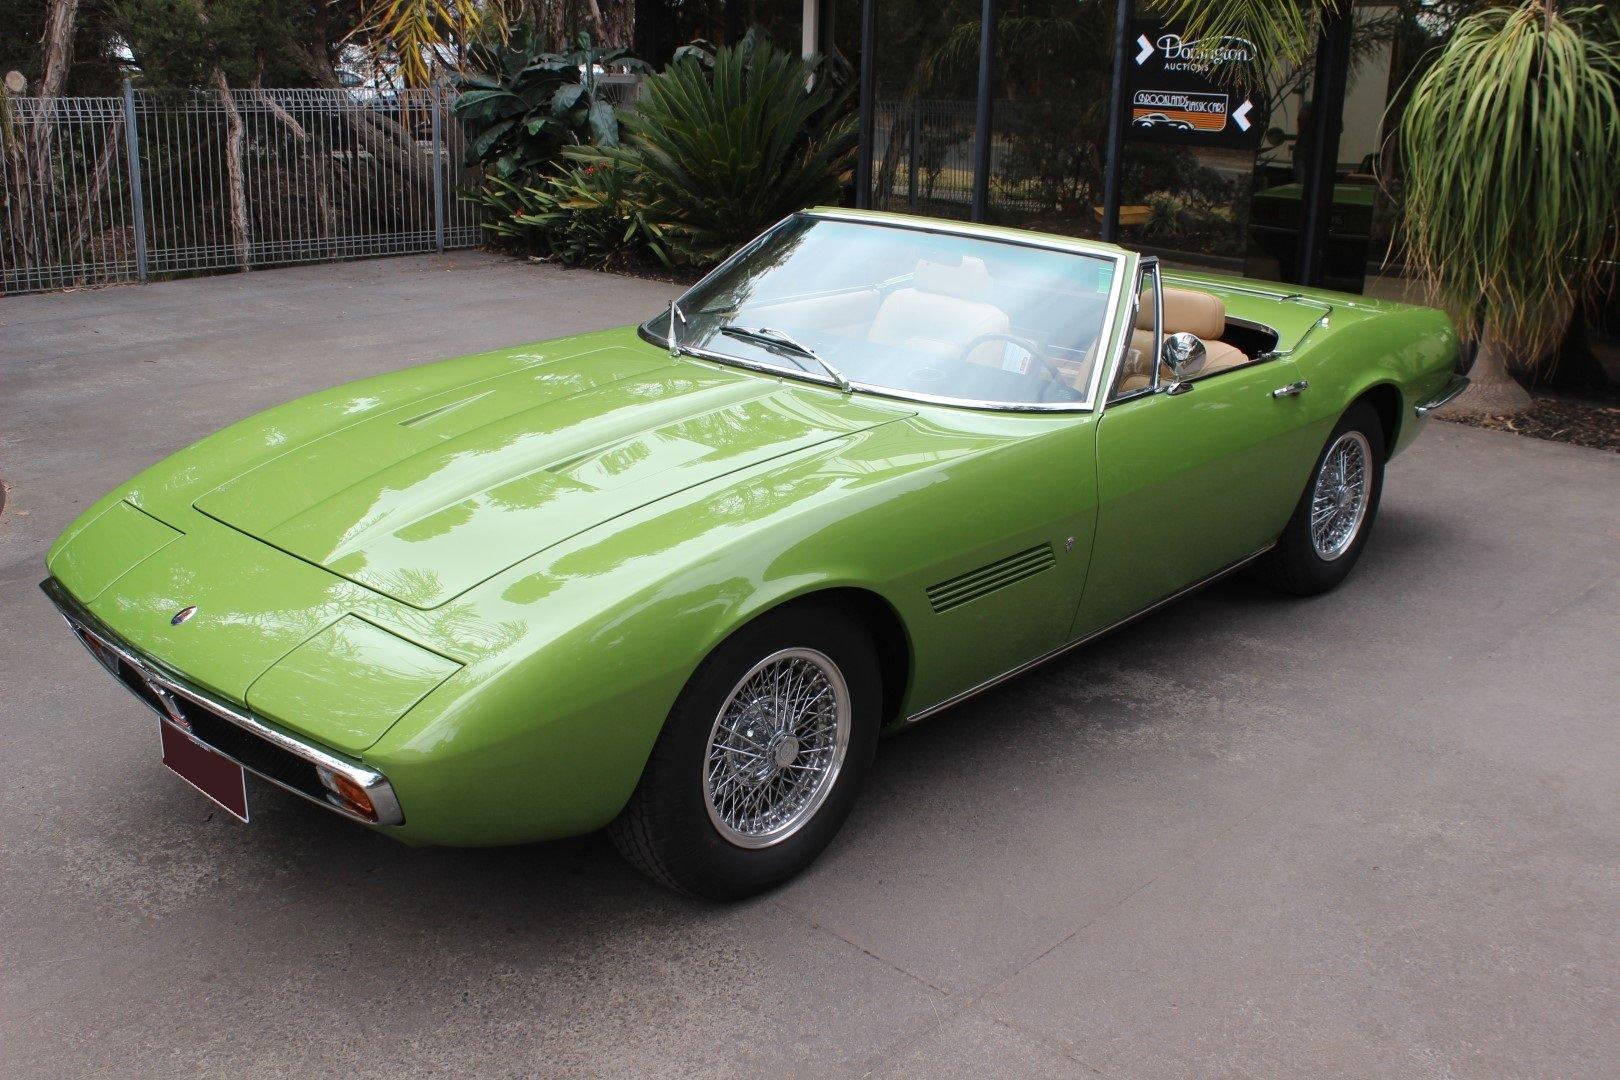 Maserati Ghibli 1969 For Sale (picture 3 of 6)